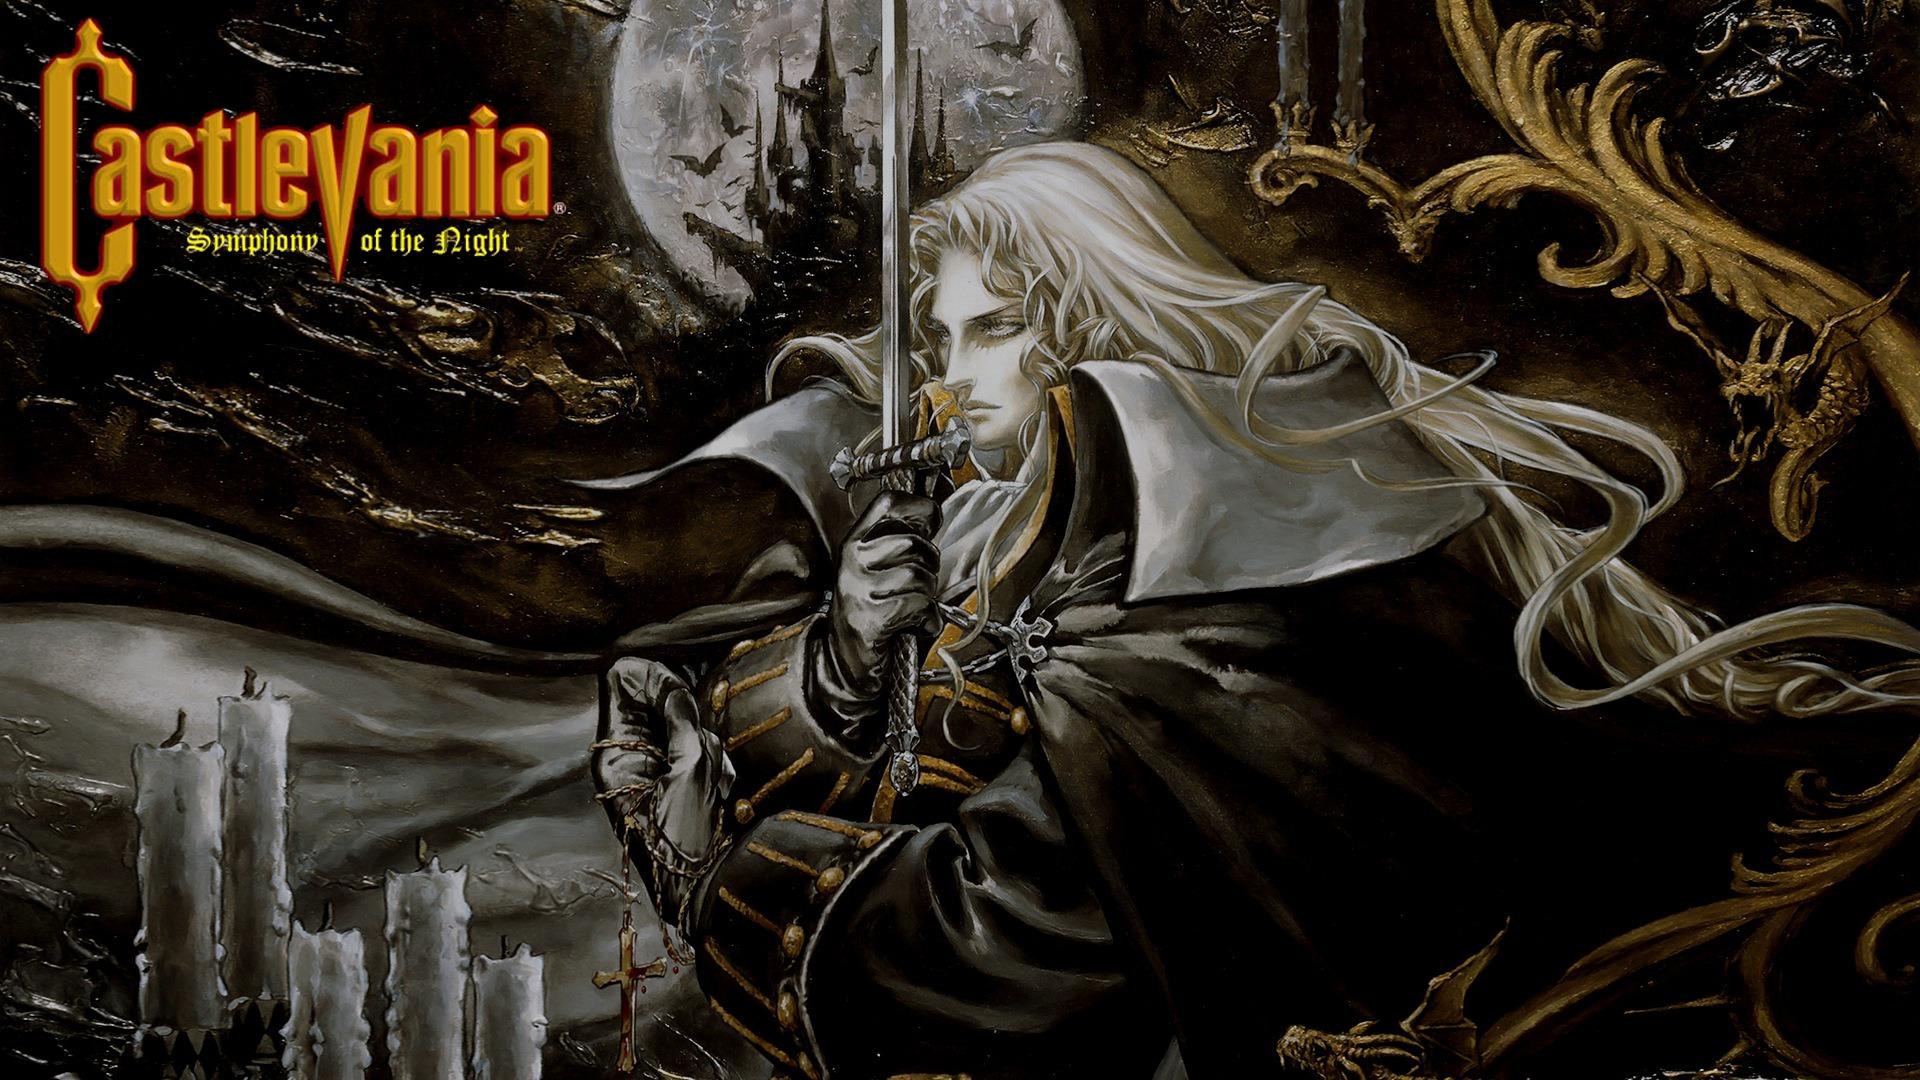 castlevania_symphony_of_the_night_art_sony_hd-wallpaper-440394.jpg